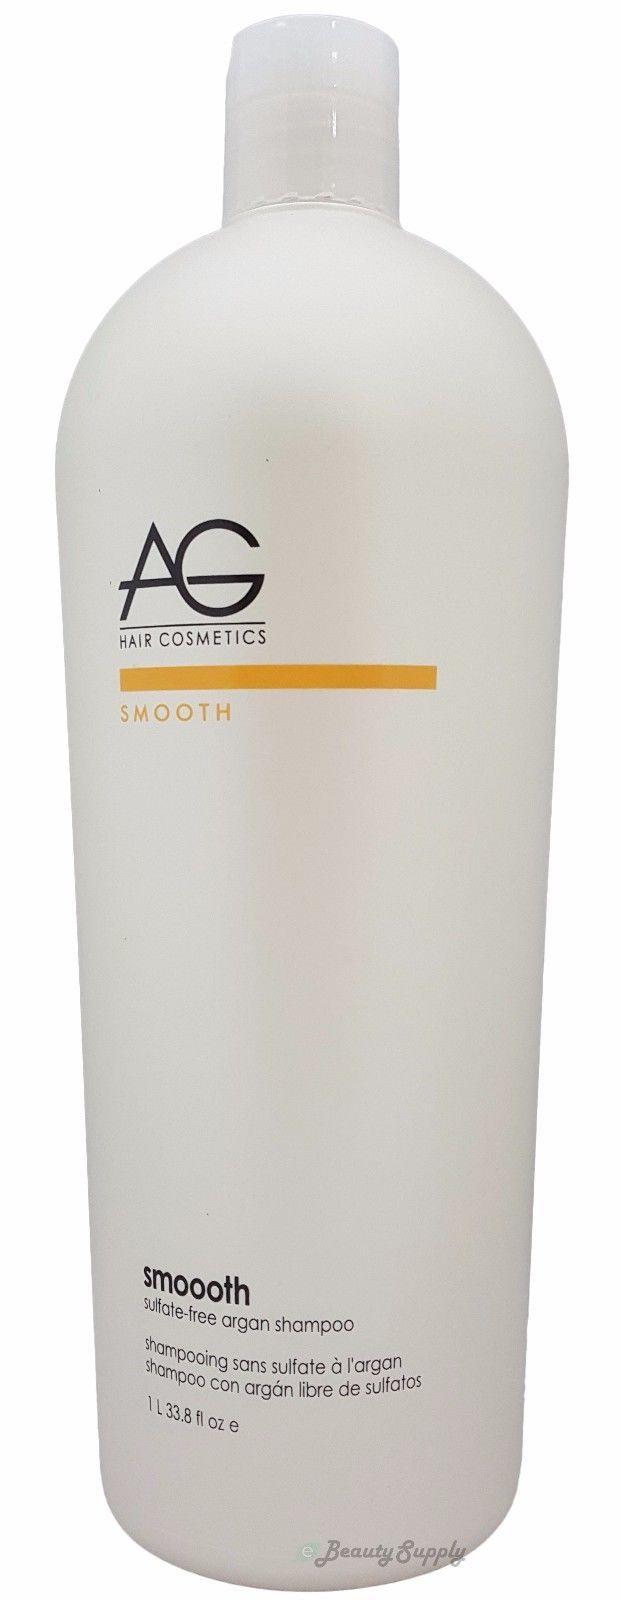 AG Hair Smooth Sulfate-Free Argan Shampoo 33.8 oz / 1000 ml  Free Shipping !!!